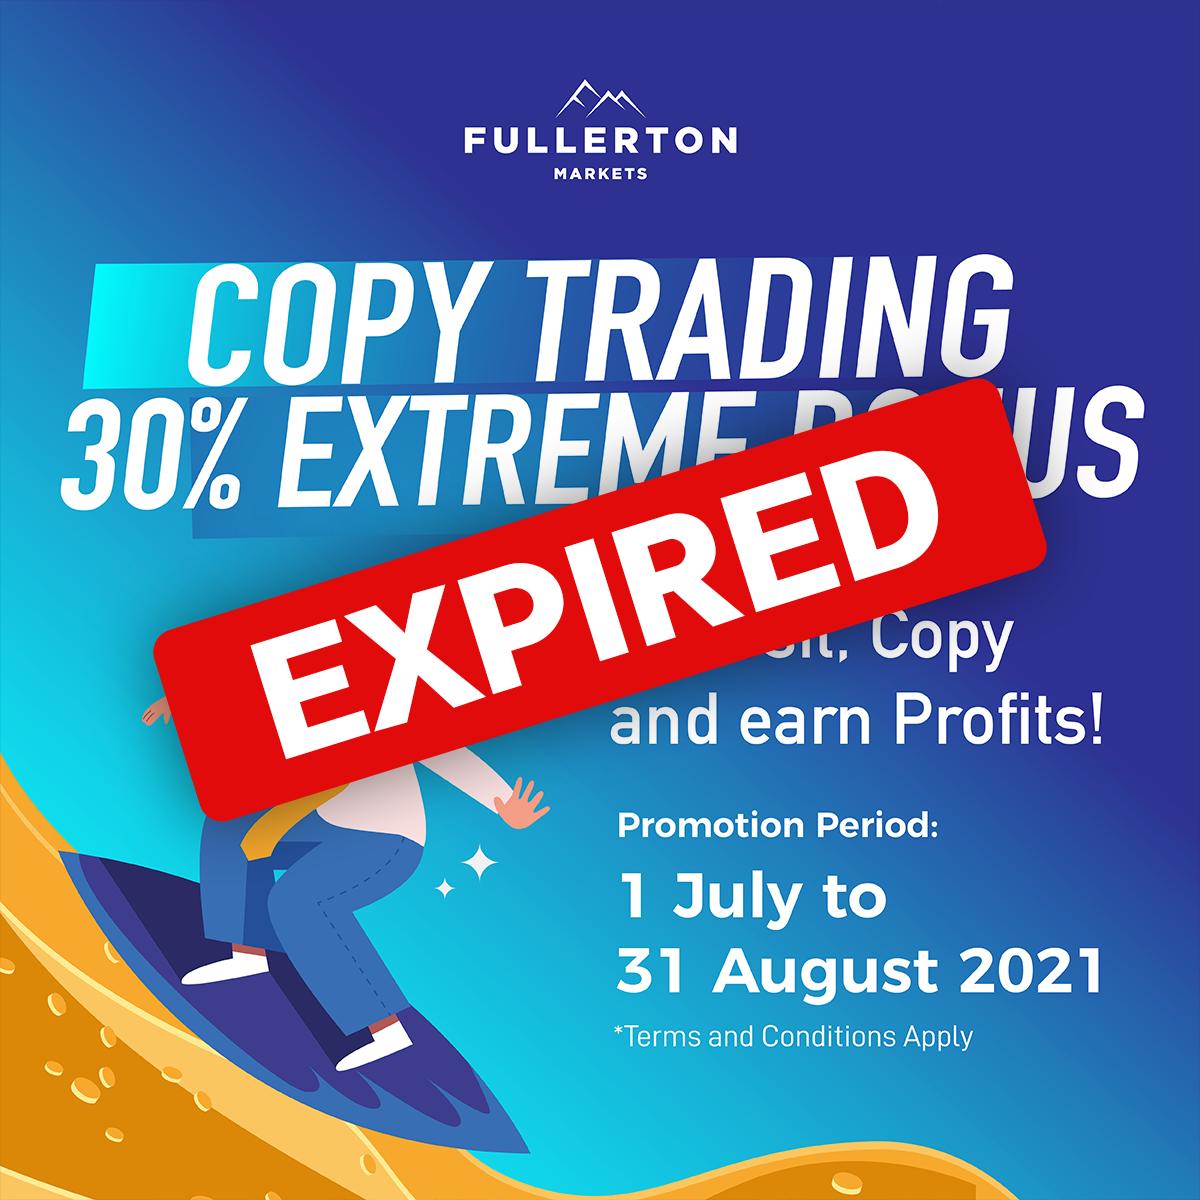 Create-banners-for-Copy-Trading-30_-Extreme-Bonus_EN-01